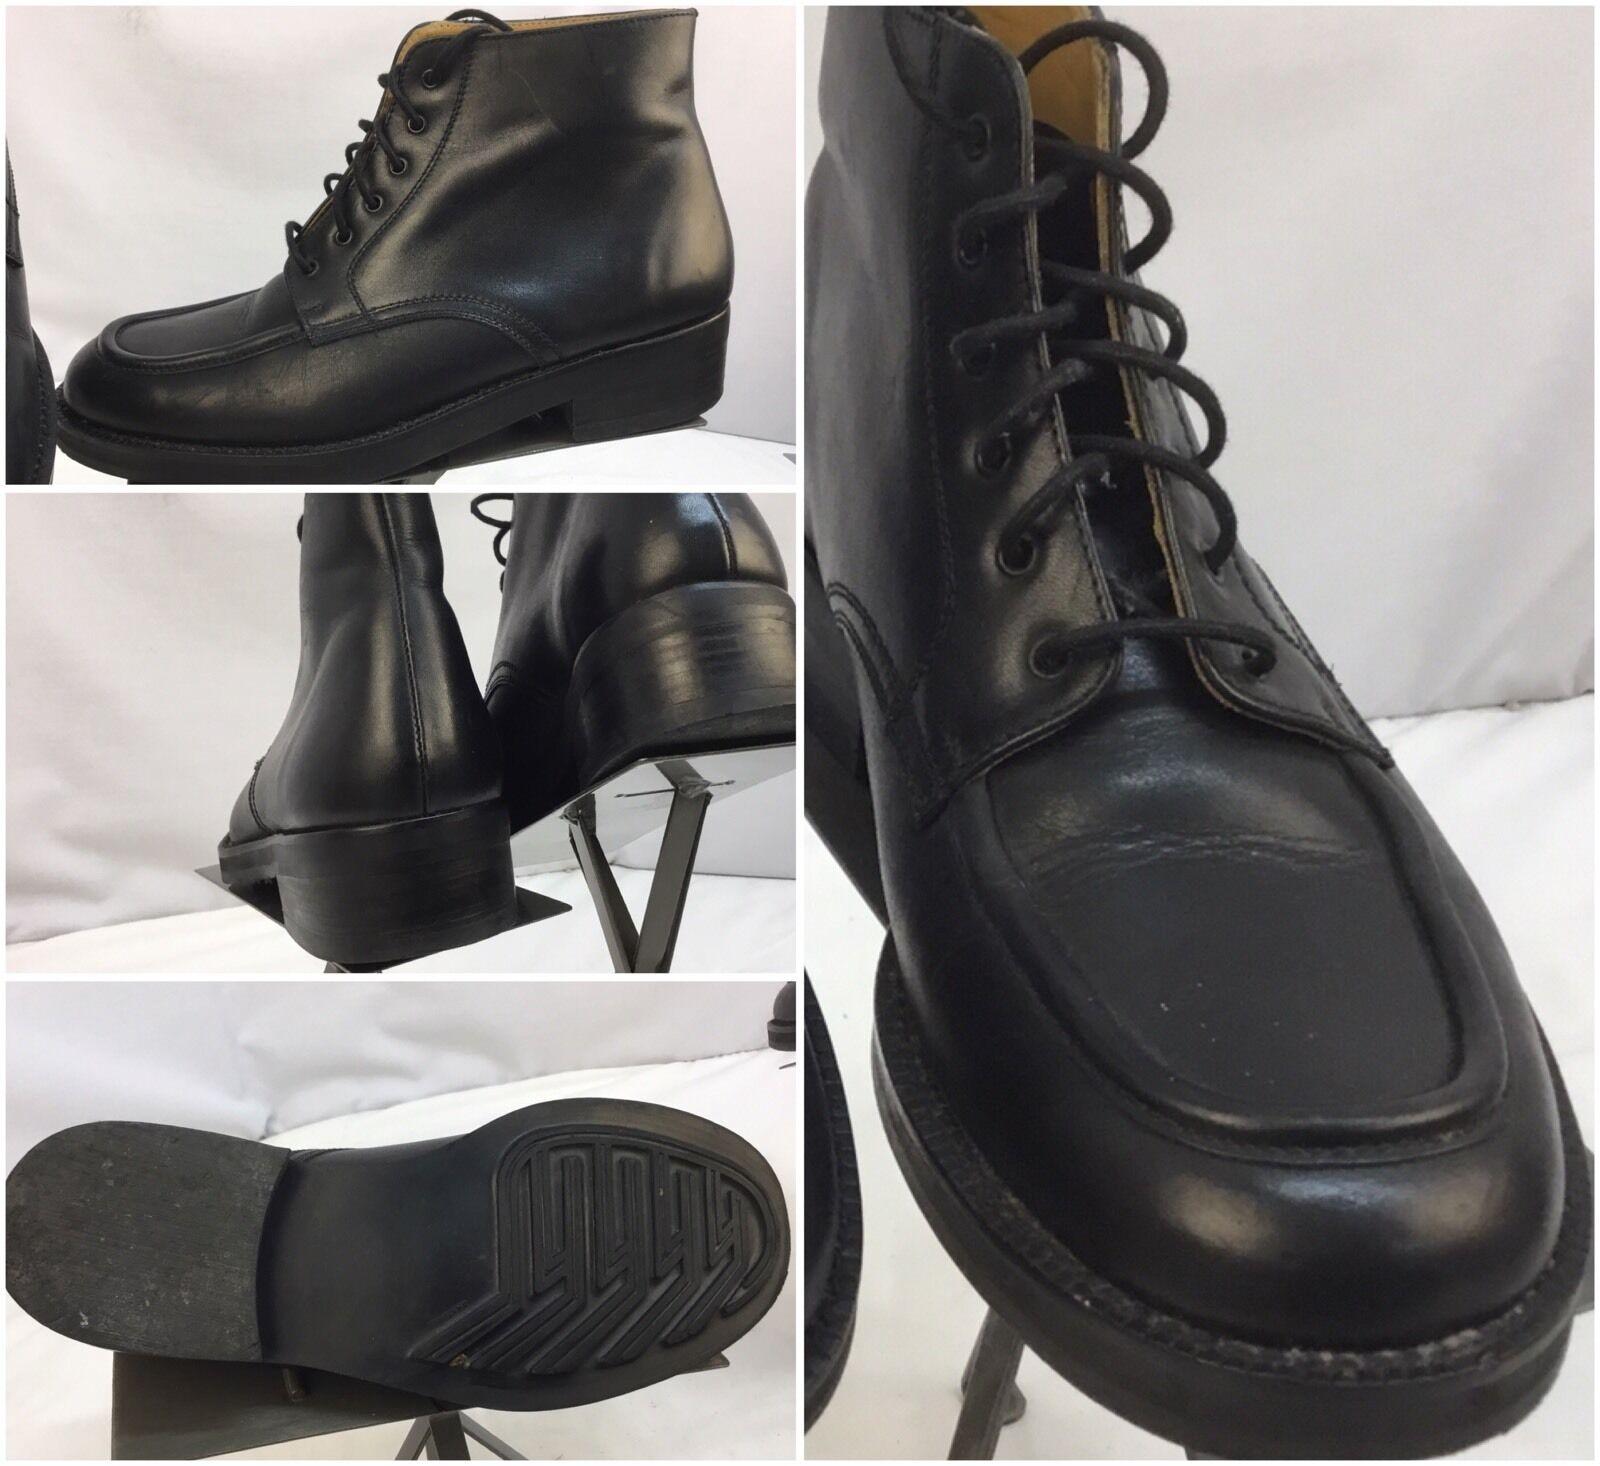 Cumbres Toltec Boots Sz 8 Men Black Leather